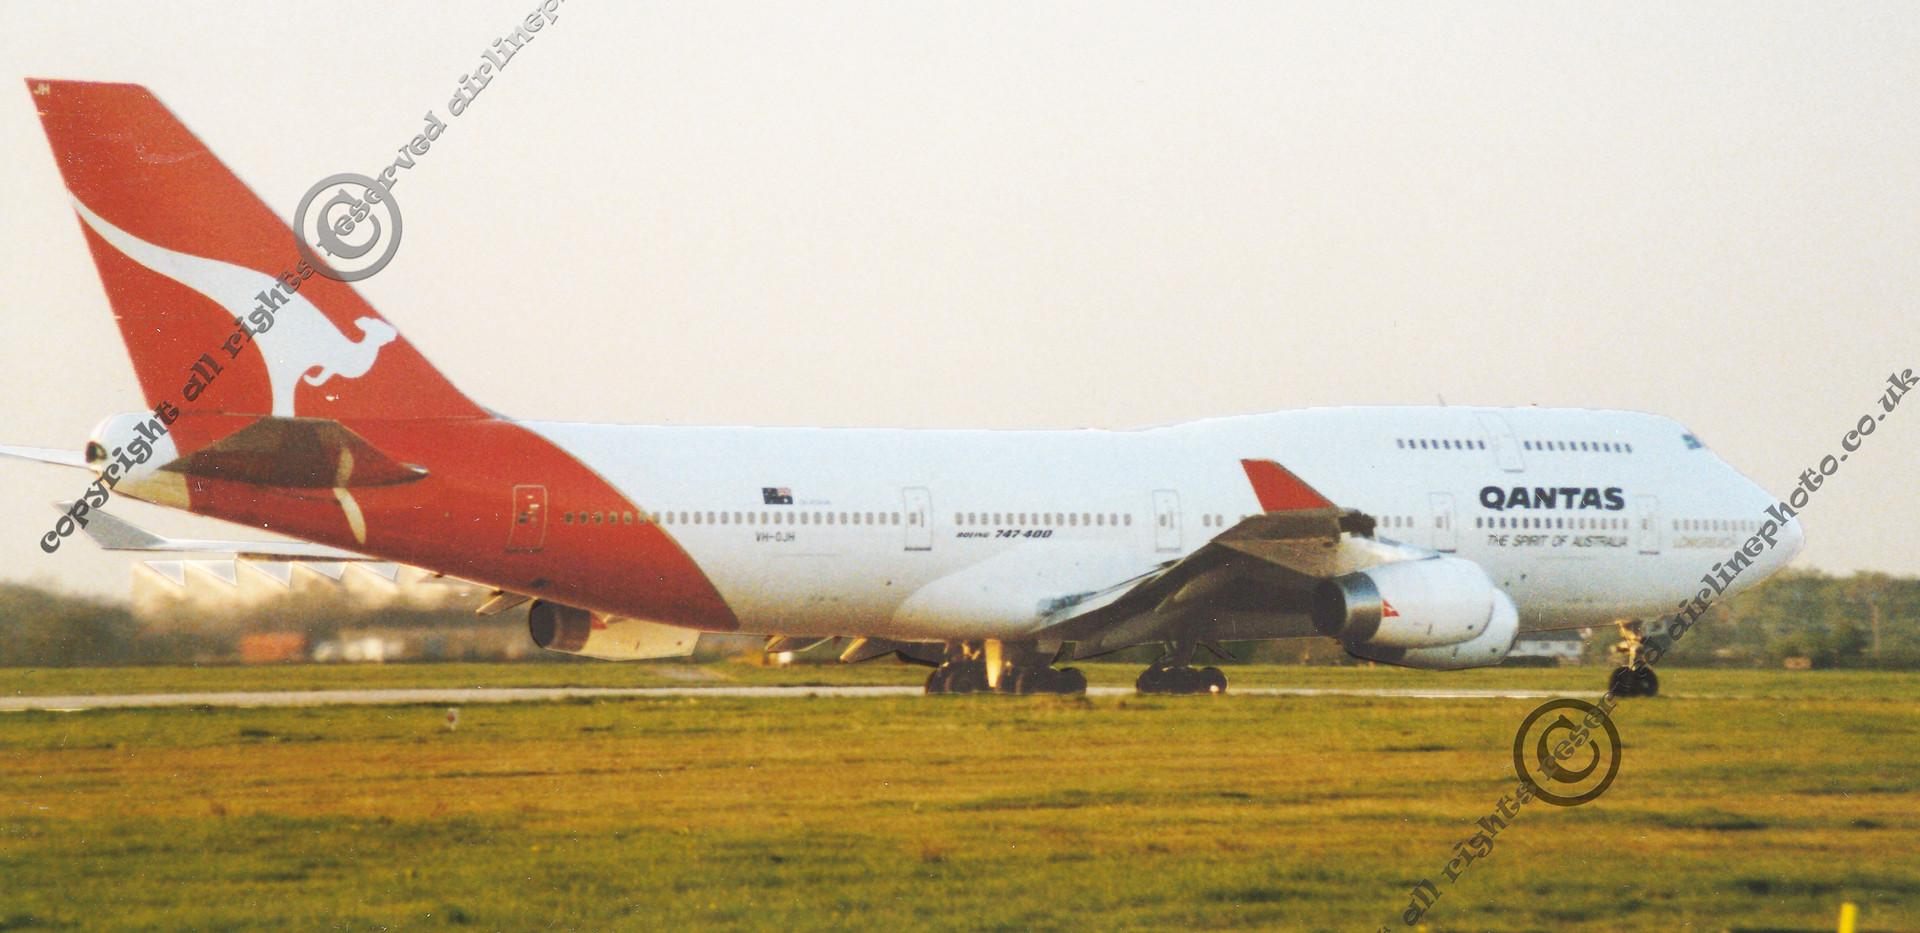 VH-OJH-Qantas-Boeing-747-MAN-1991.jpg